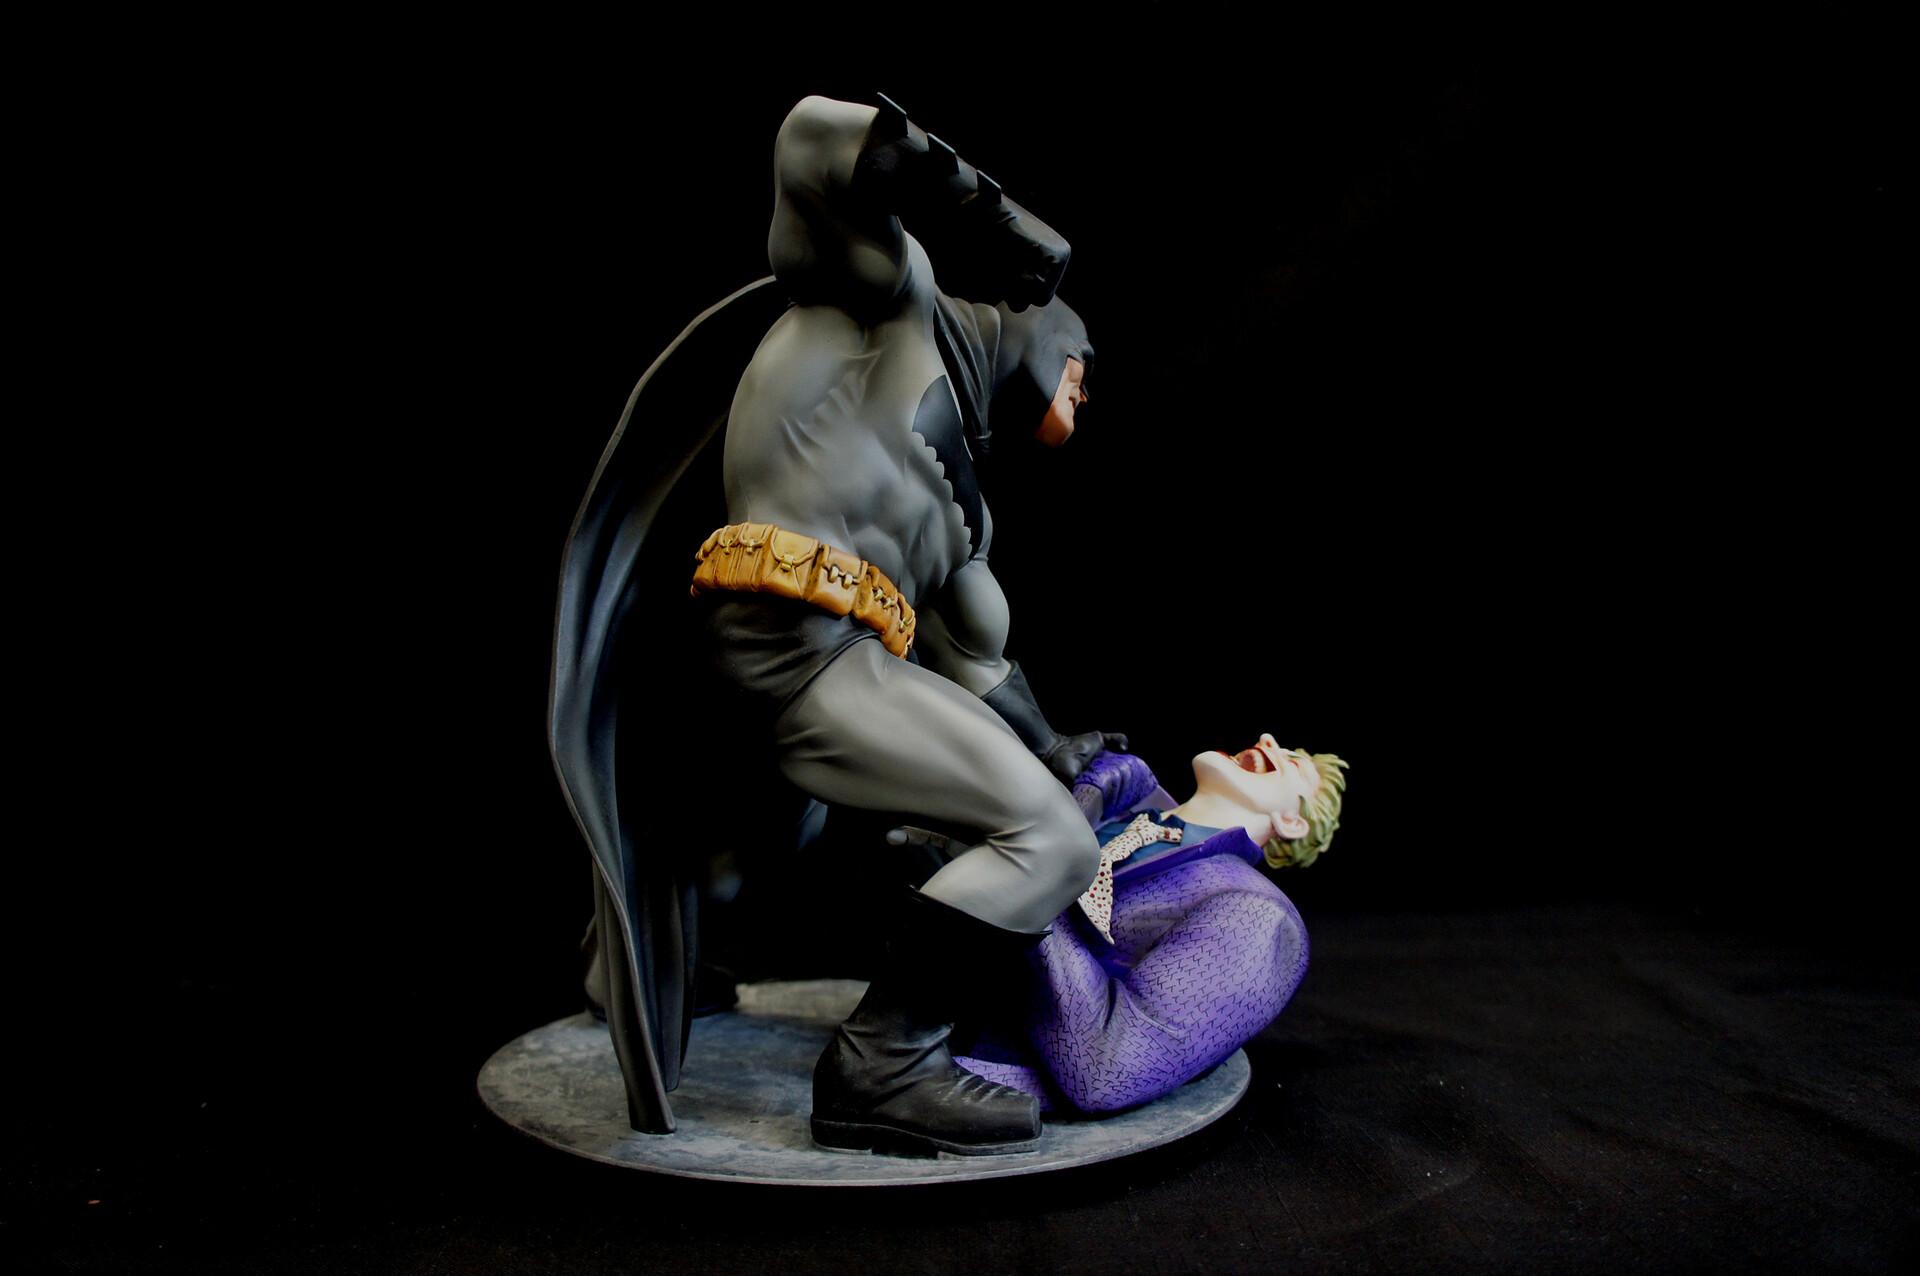 Frank Miller Dark Knight Batman vs Joker Diorama Art Statue